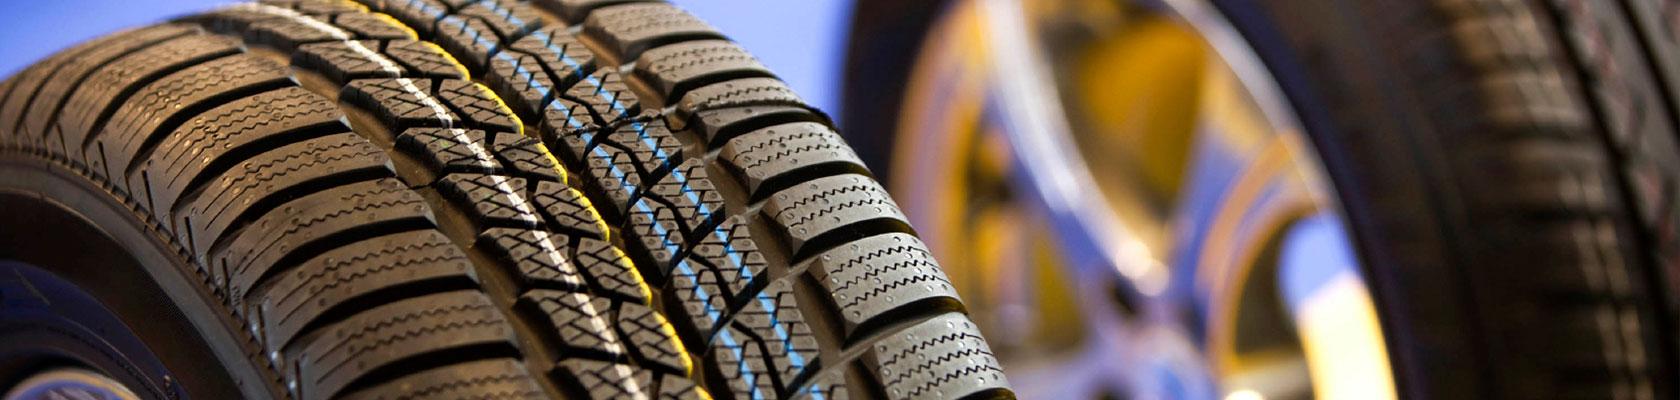 & Genuine Parts at Trinity Auto Group - Trinity Auto Group markmcfarlin.com